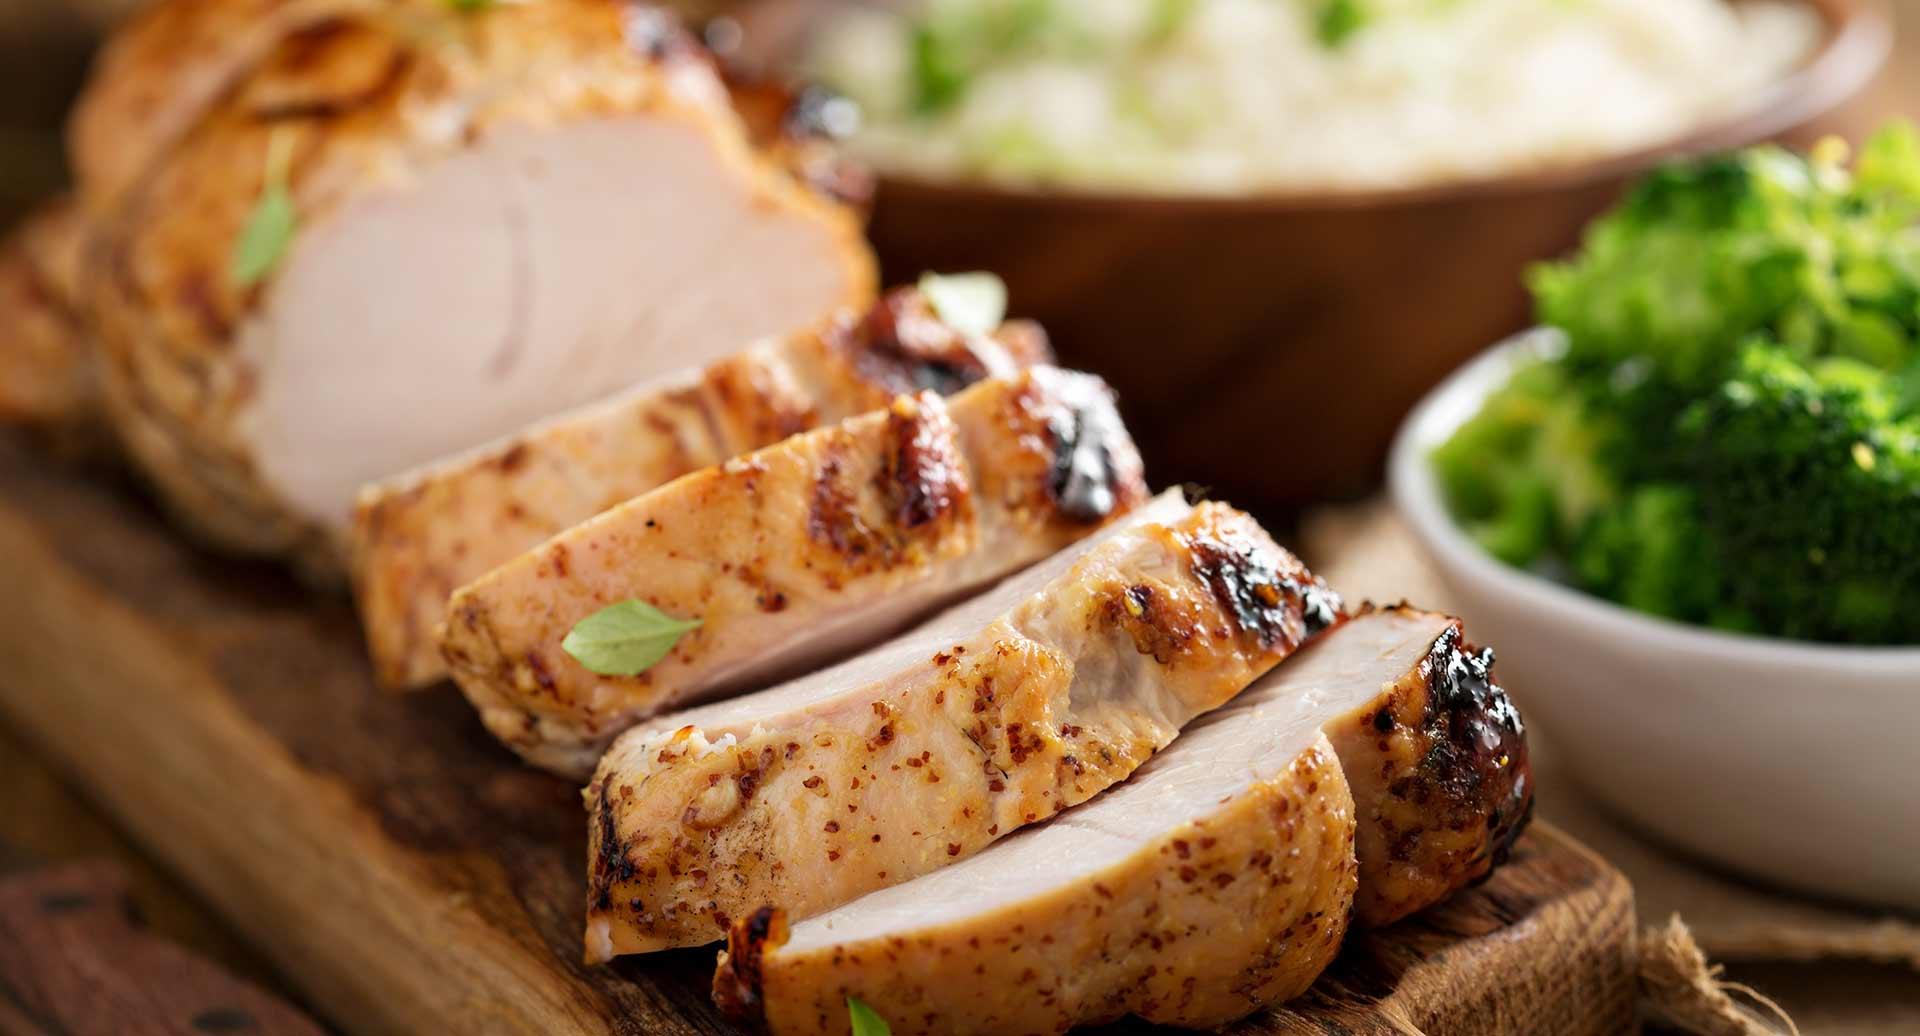 Butter & Herb Roasted Turkey - Chef Donald | Ferndale Market